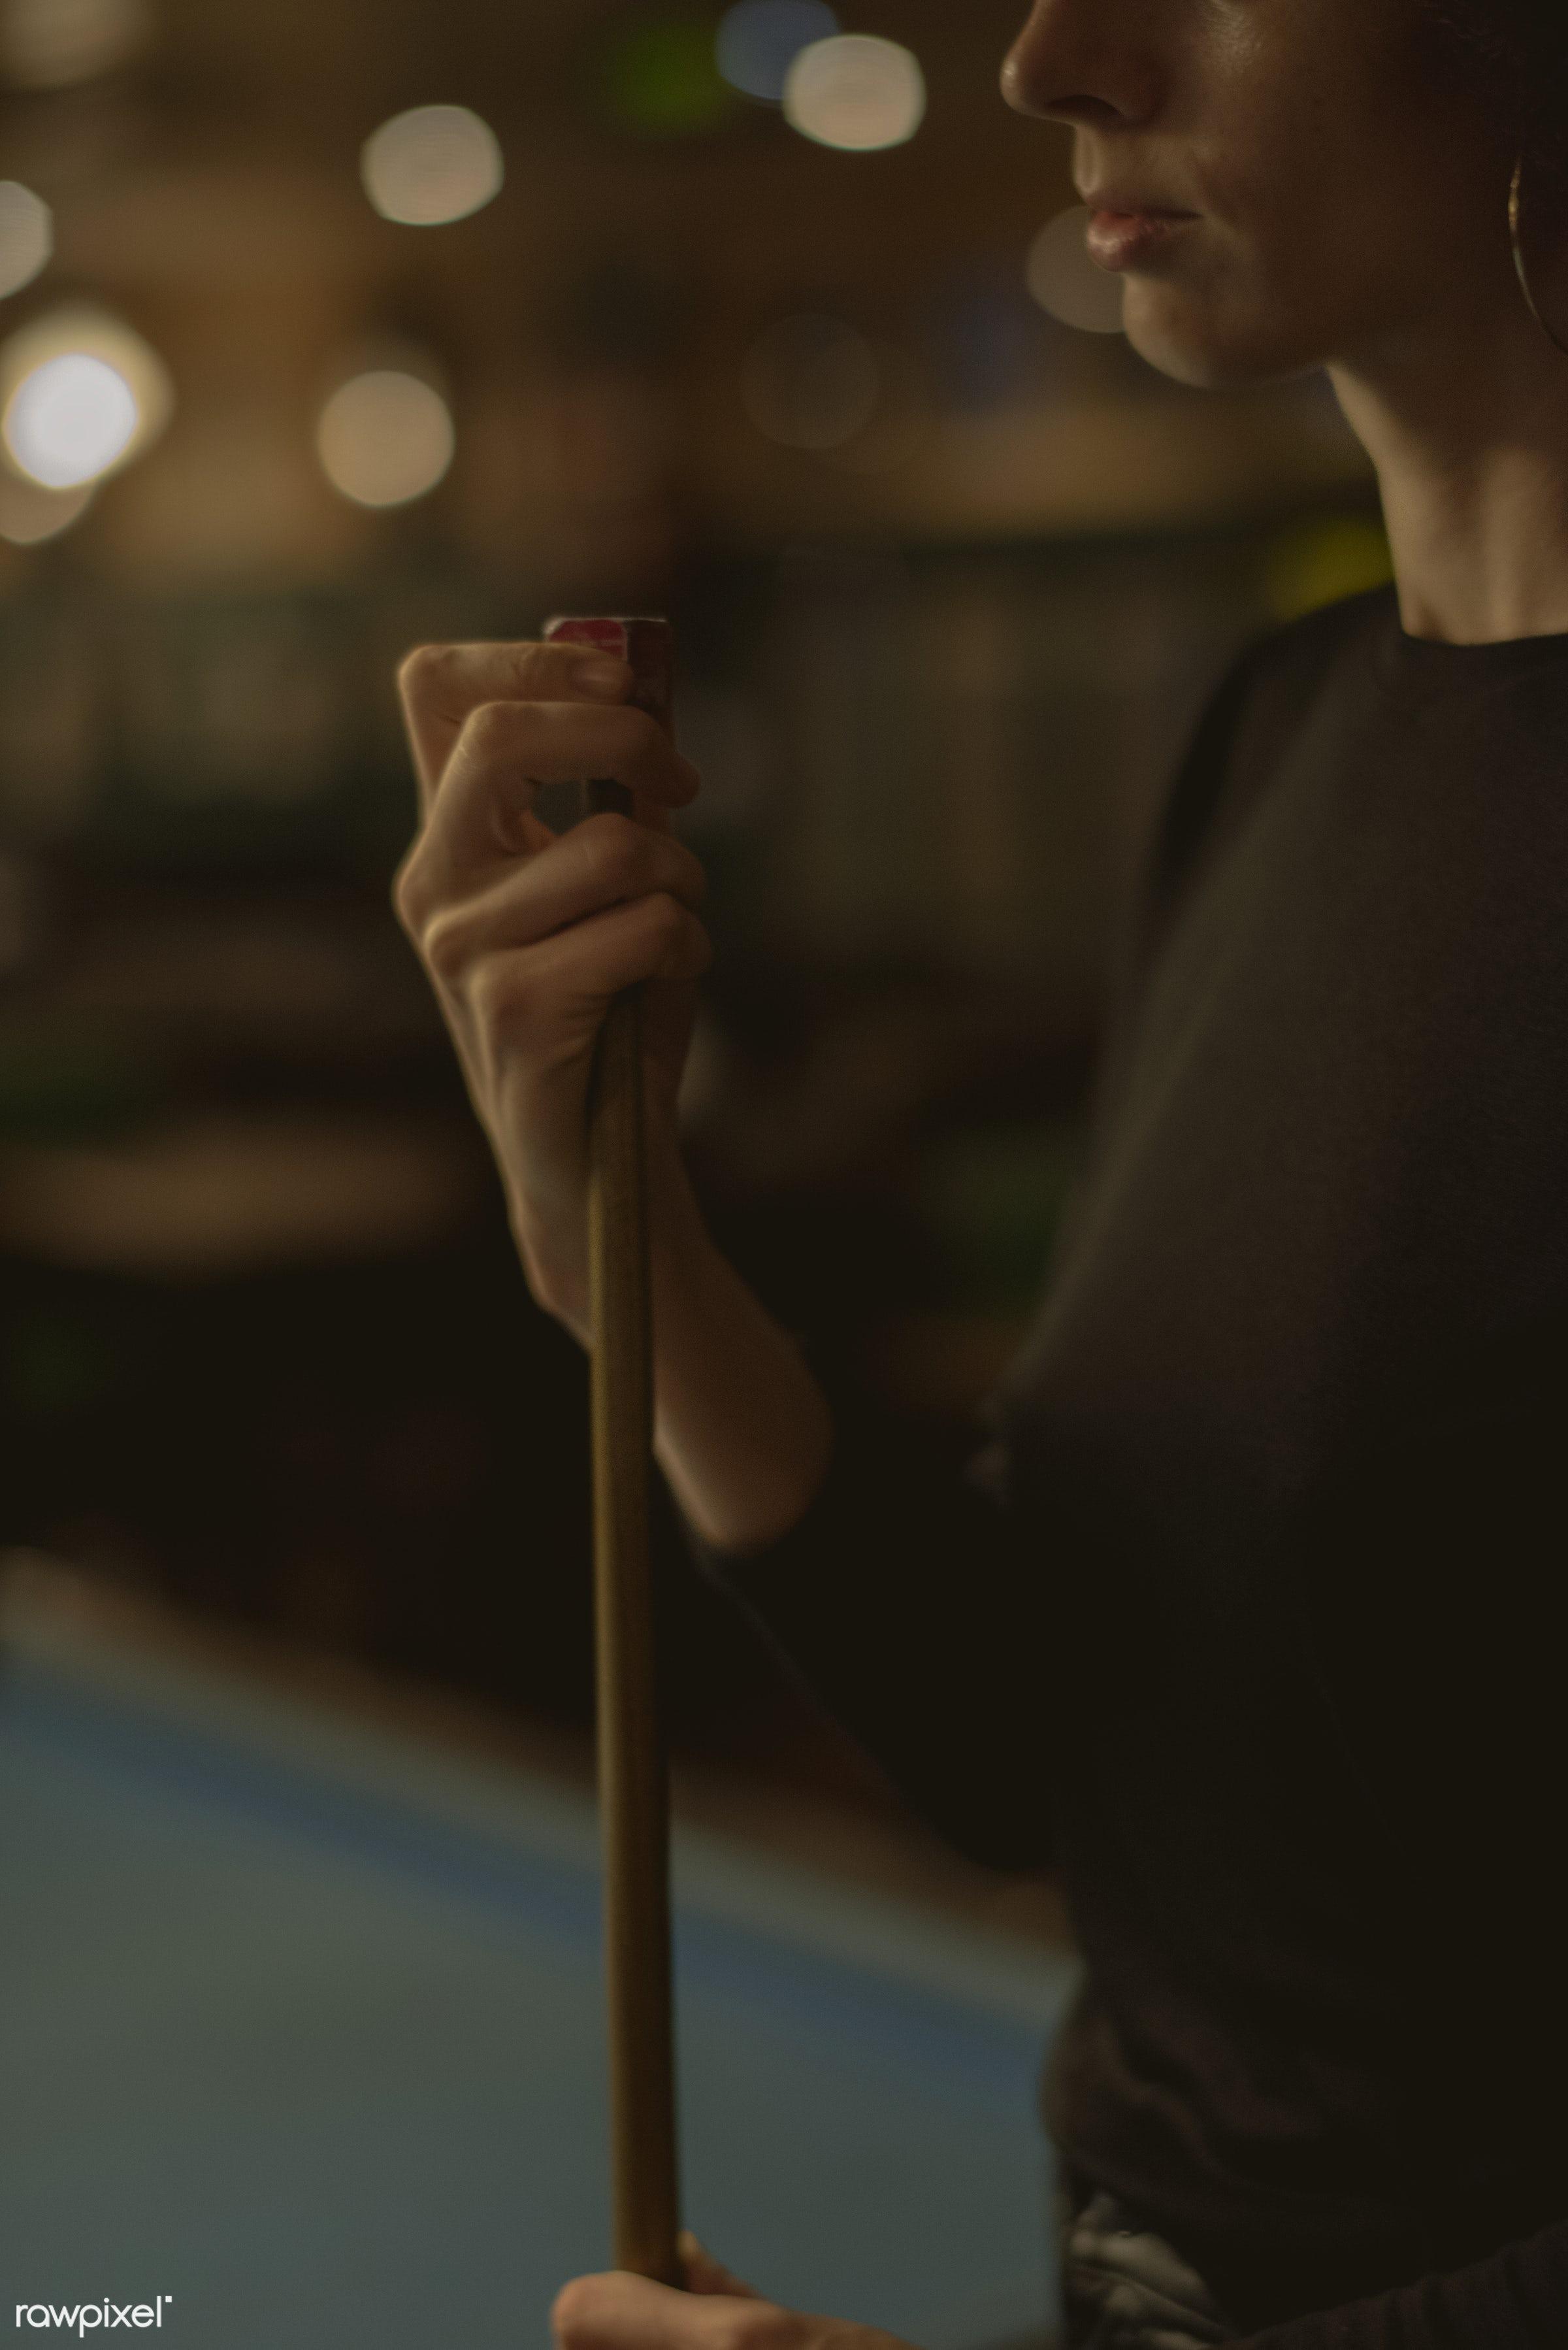 Woman playing pool at a bar - billiard, 8 ball, alone, bar, cue, curly hair, dark, entertain, game, lifestyle, night, night...